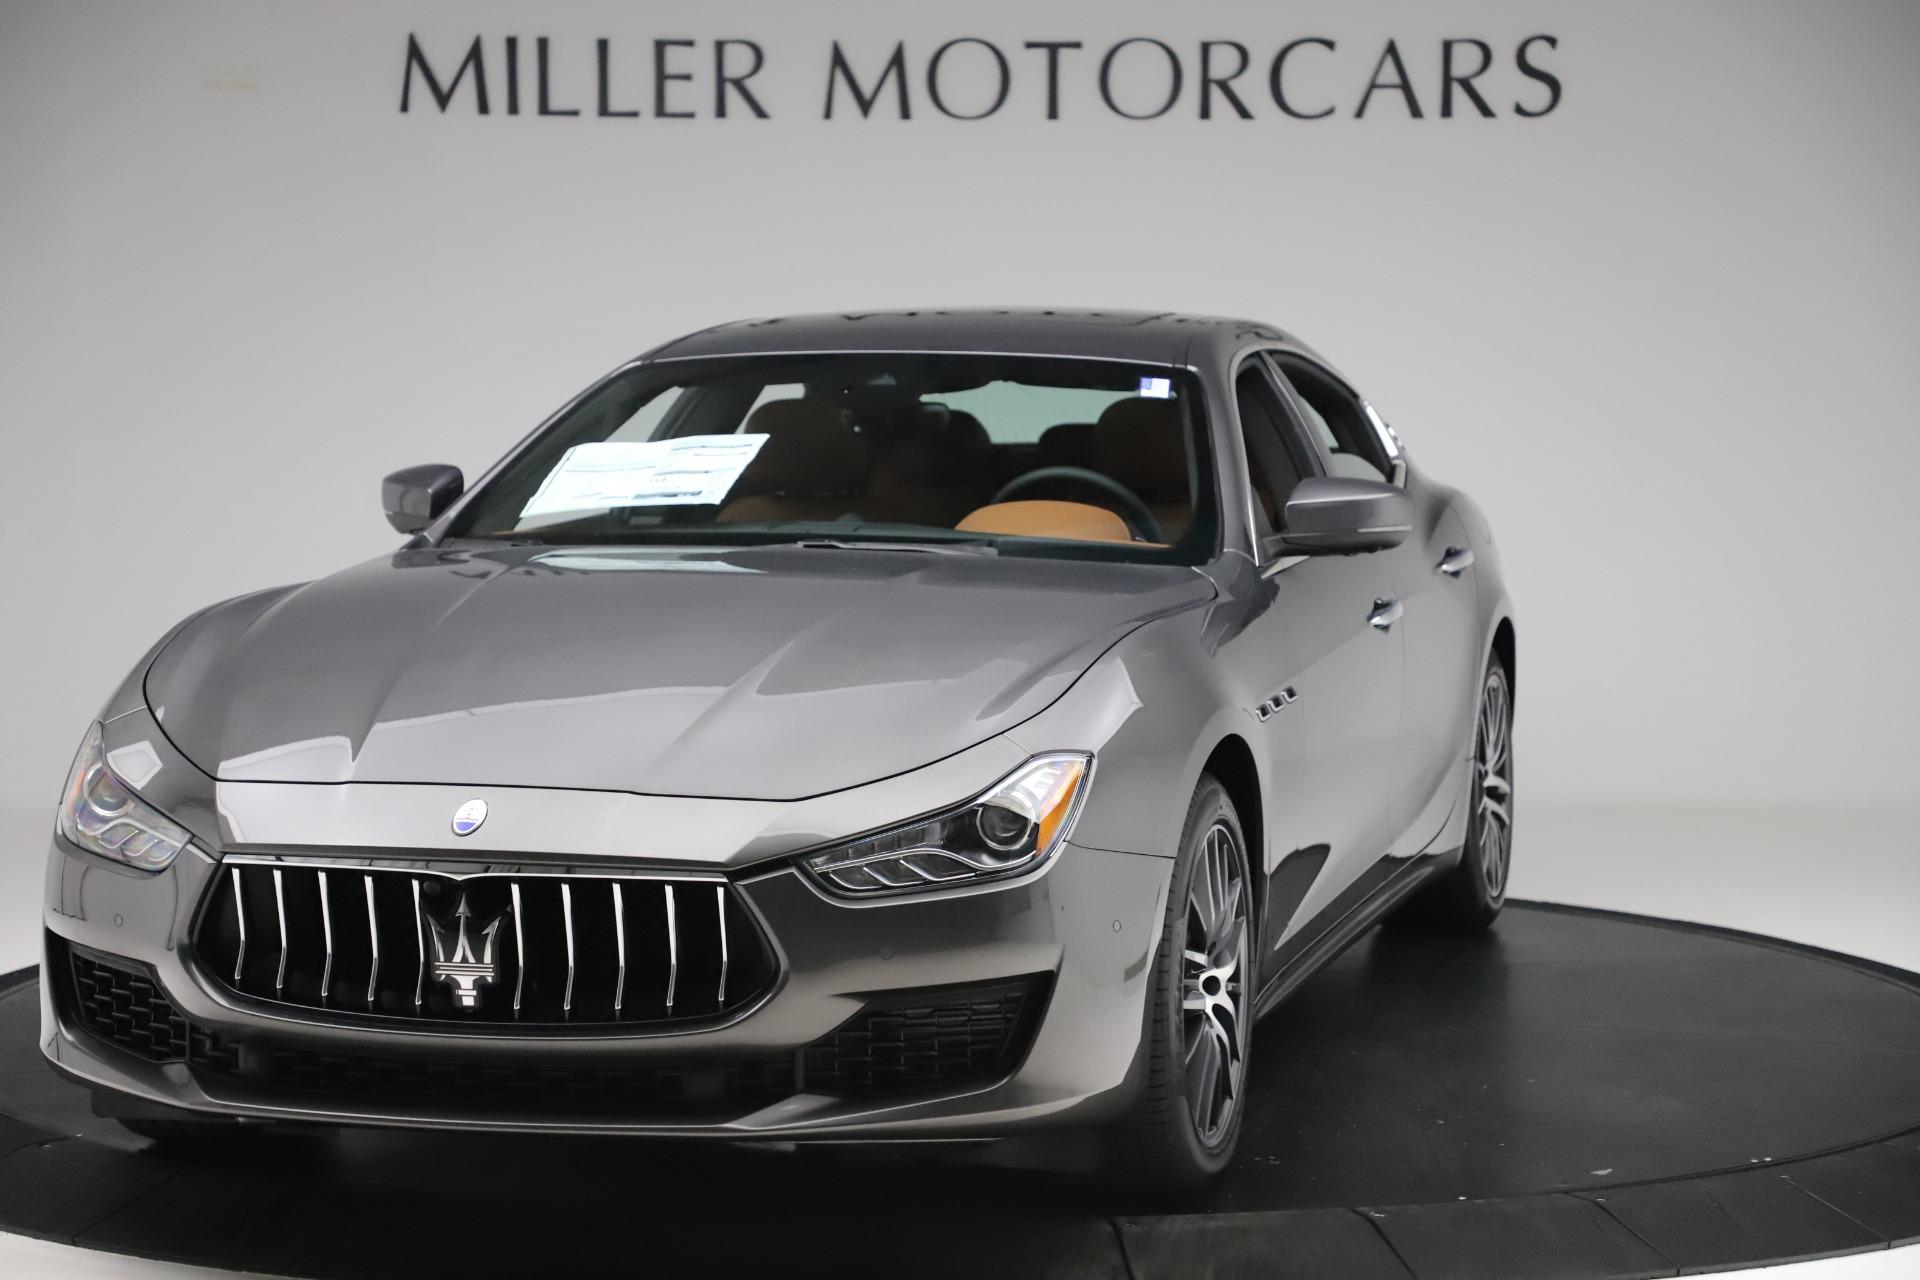 New 2019 Maserati Ghibli S Q4 for sale Sold at Aston Martin of Greenwich in Greenwich CT 06830 1